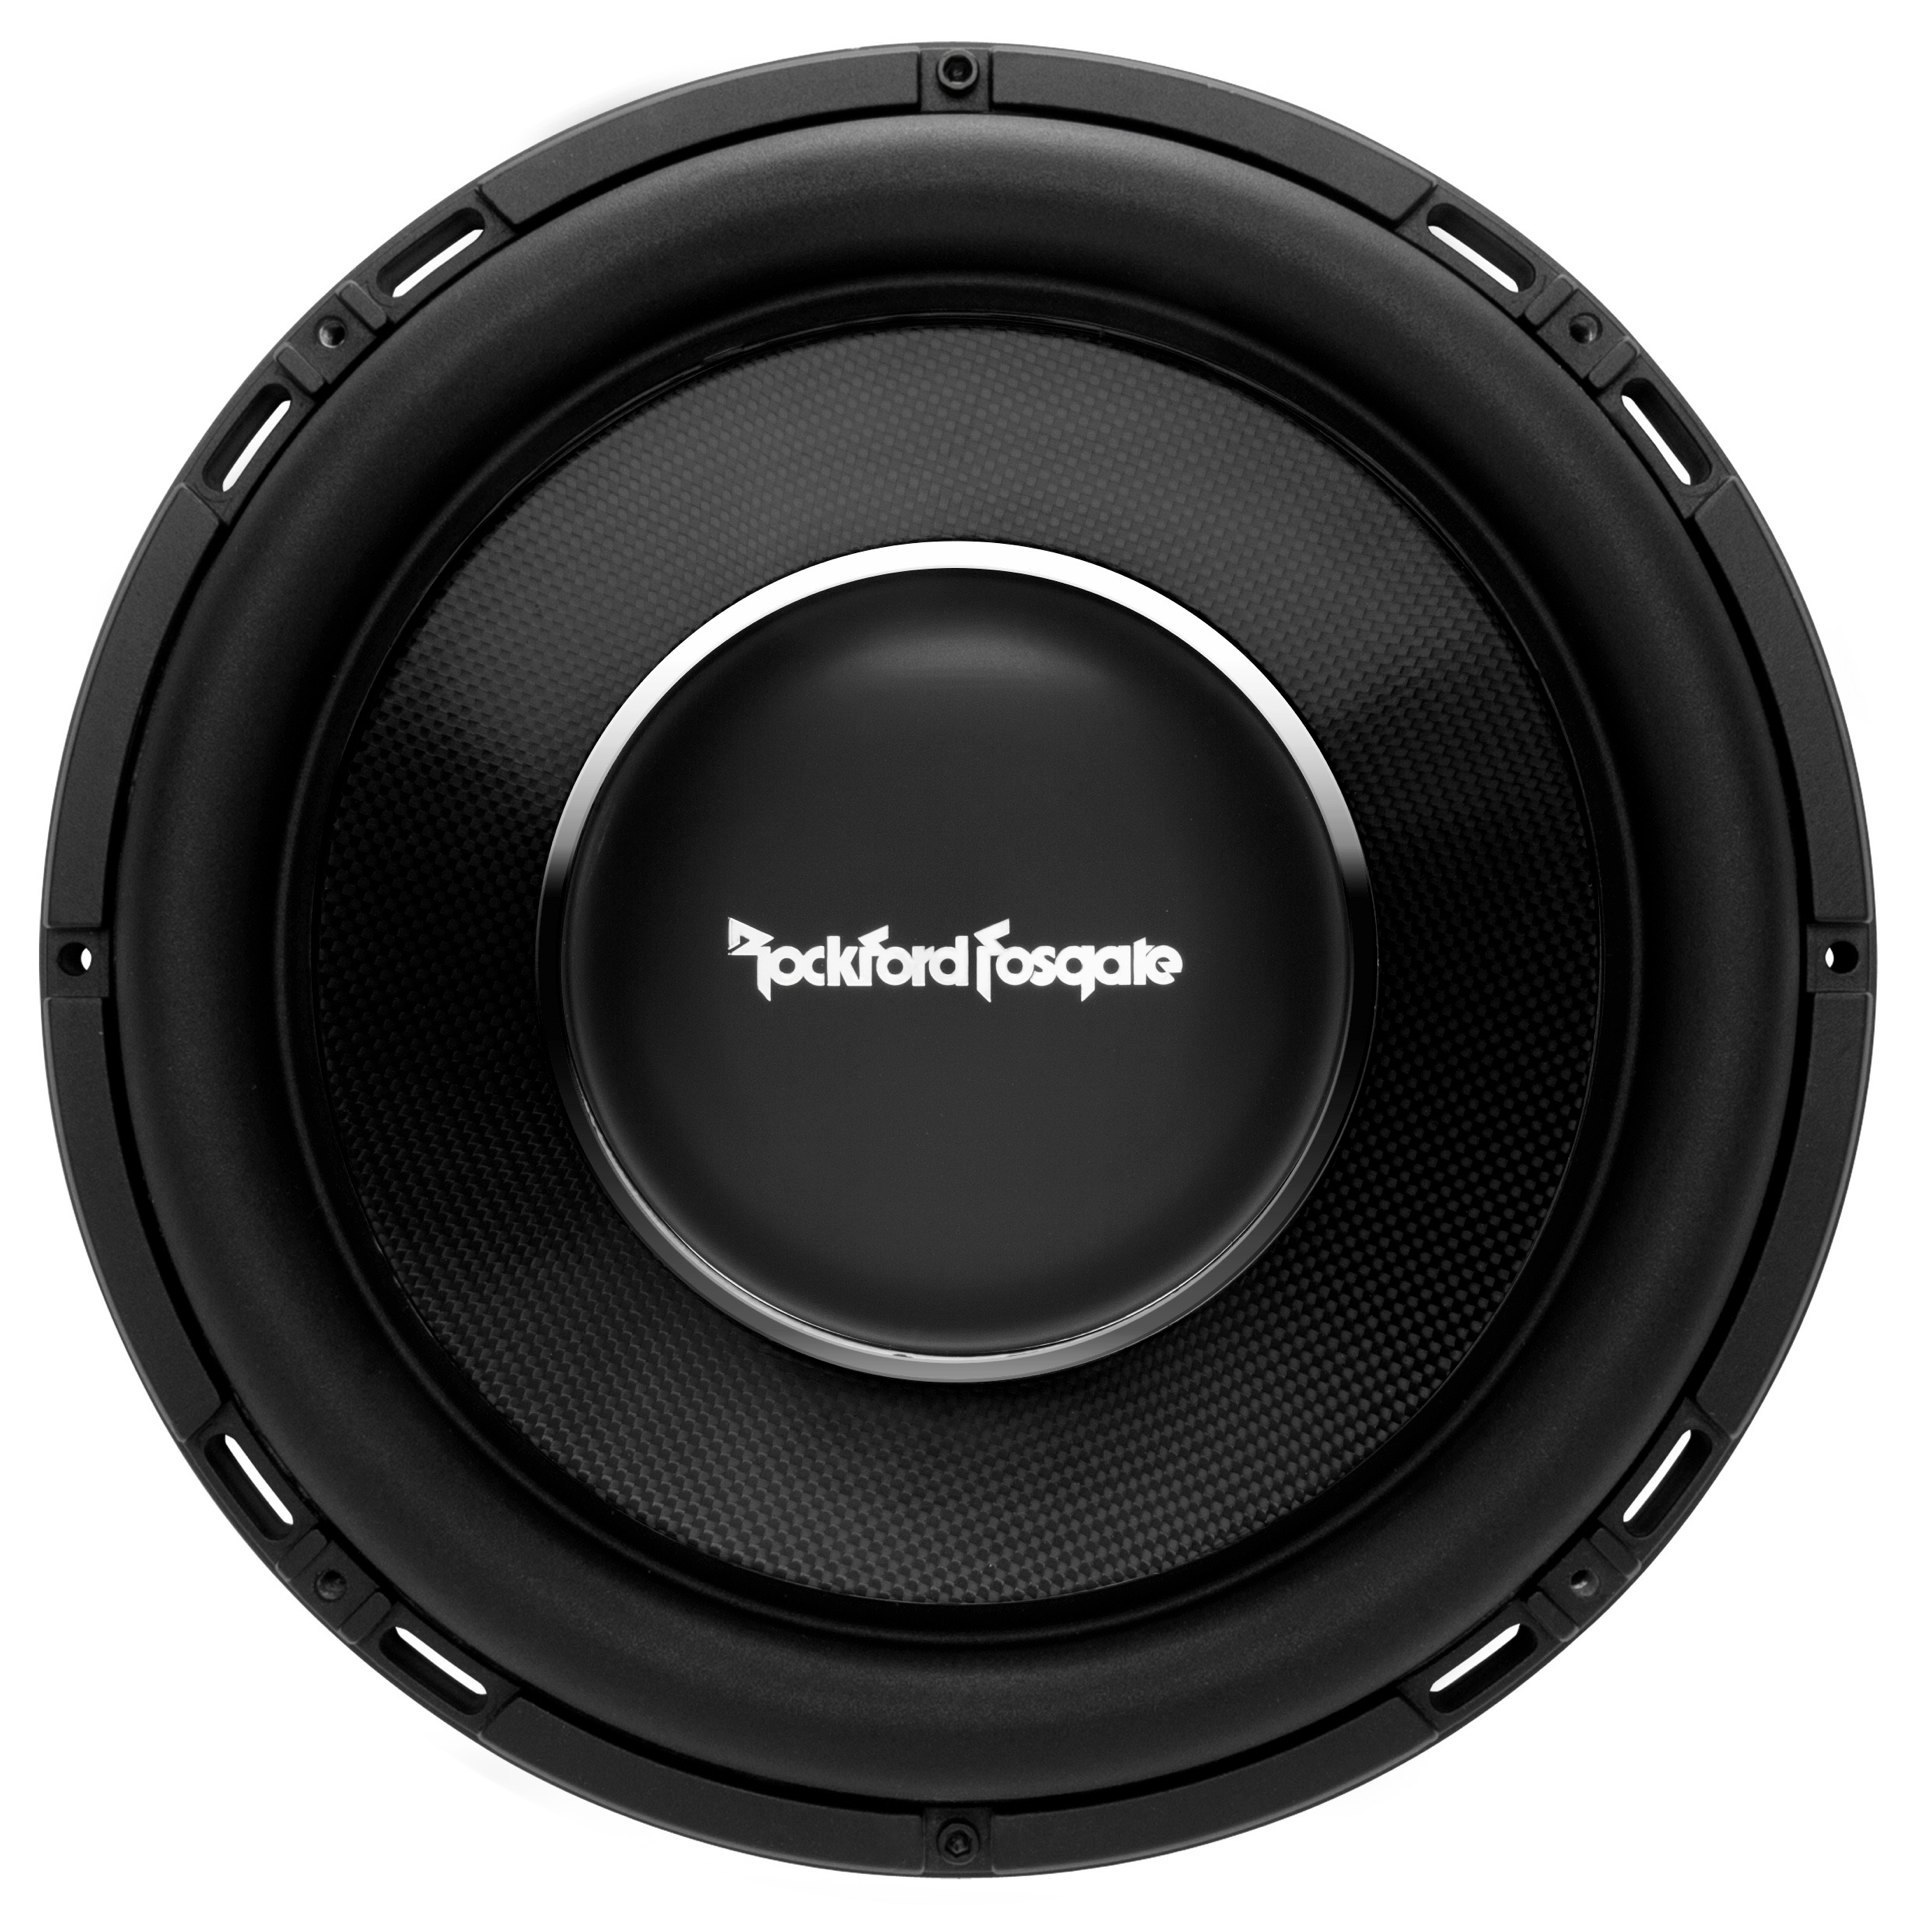 rockford fosgate subwoofer power t1 t1s1 12 flach. Black Bedroom Furniture Sets. Home Design Ideas